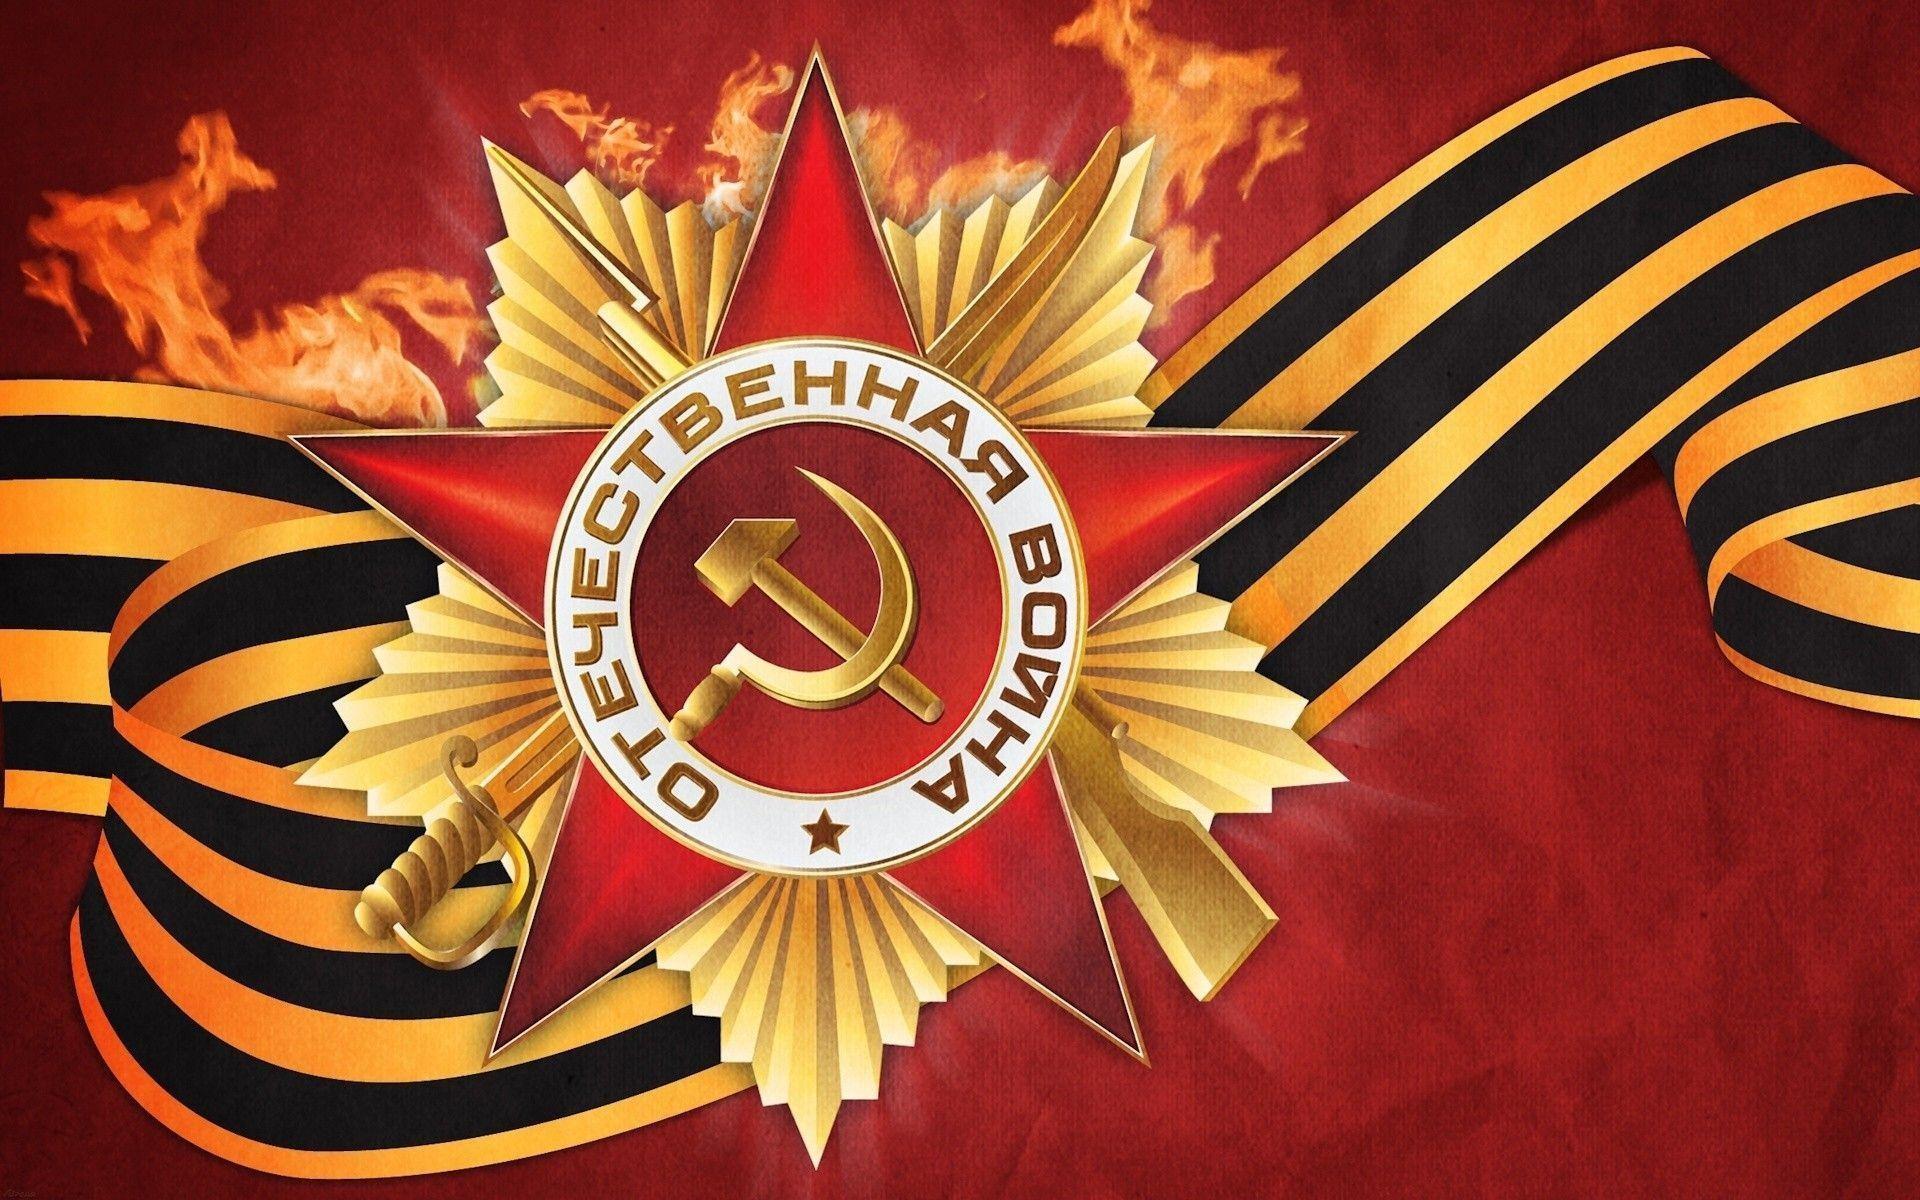 Soviet wallpaper hd 72 images - 4k wallpaper russia ...